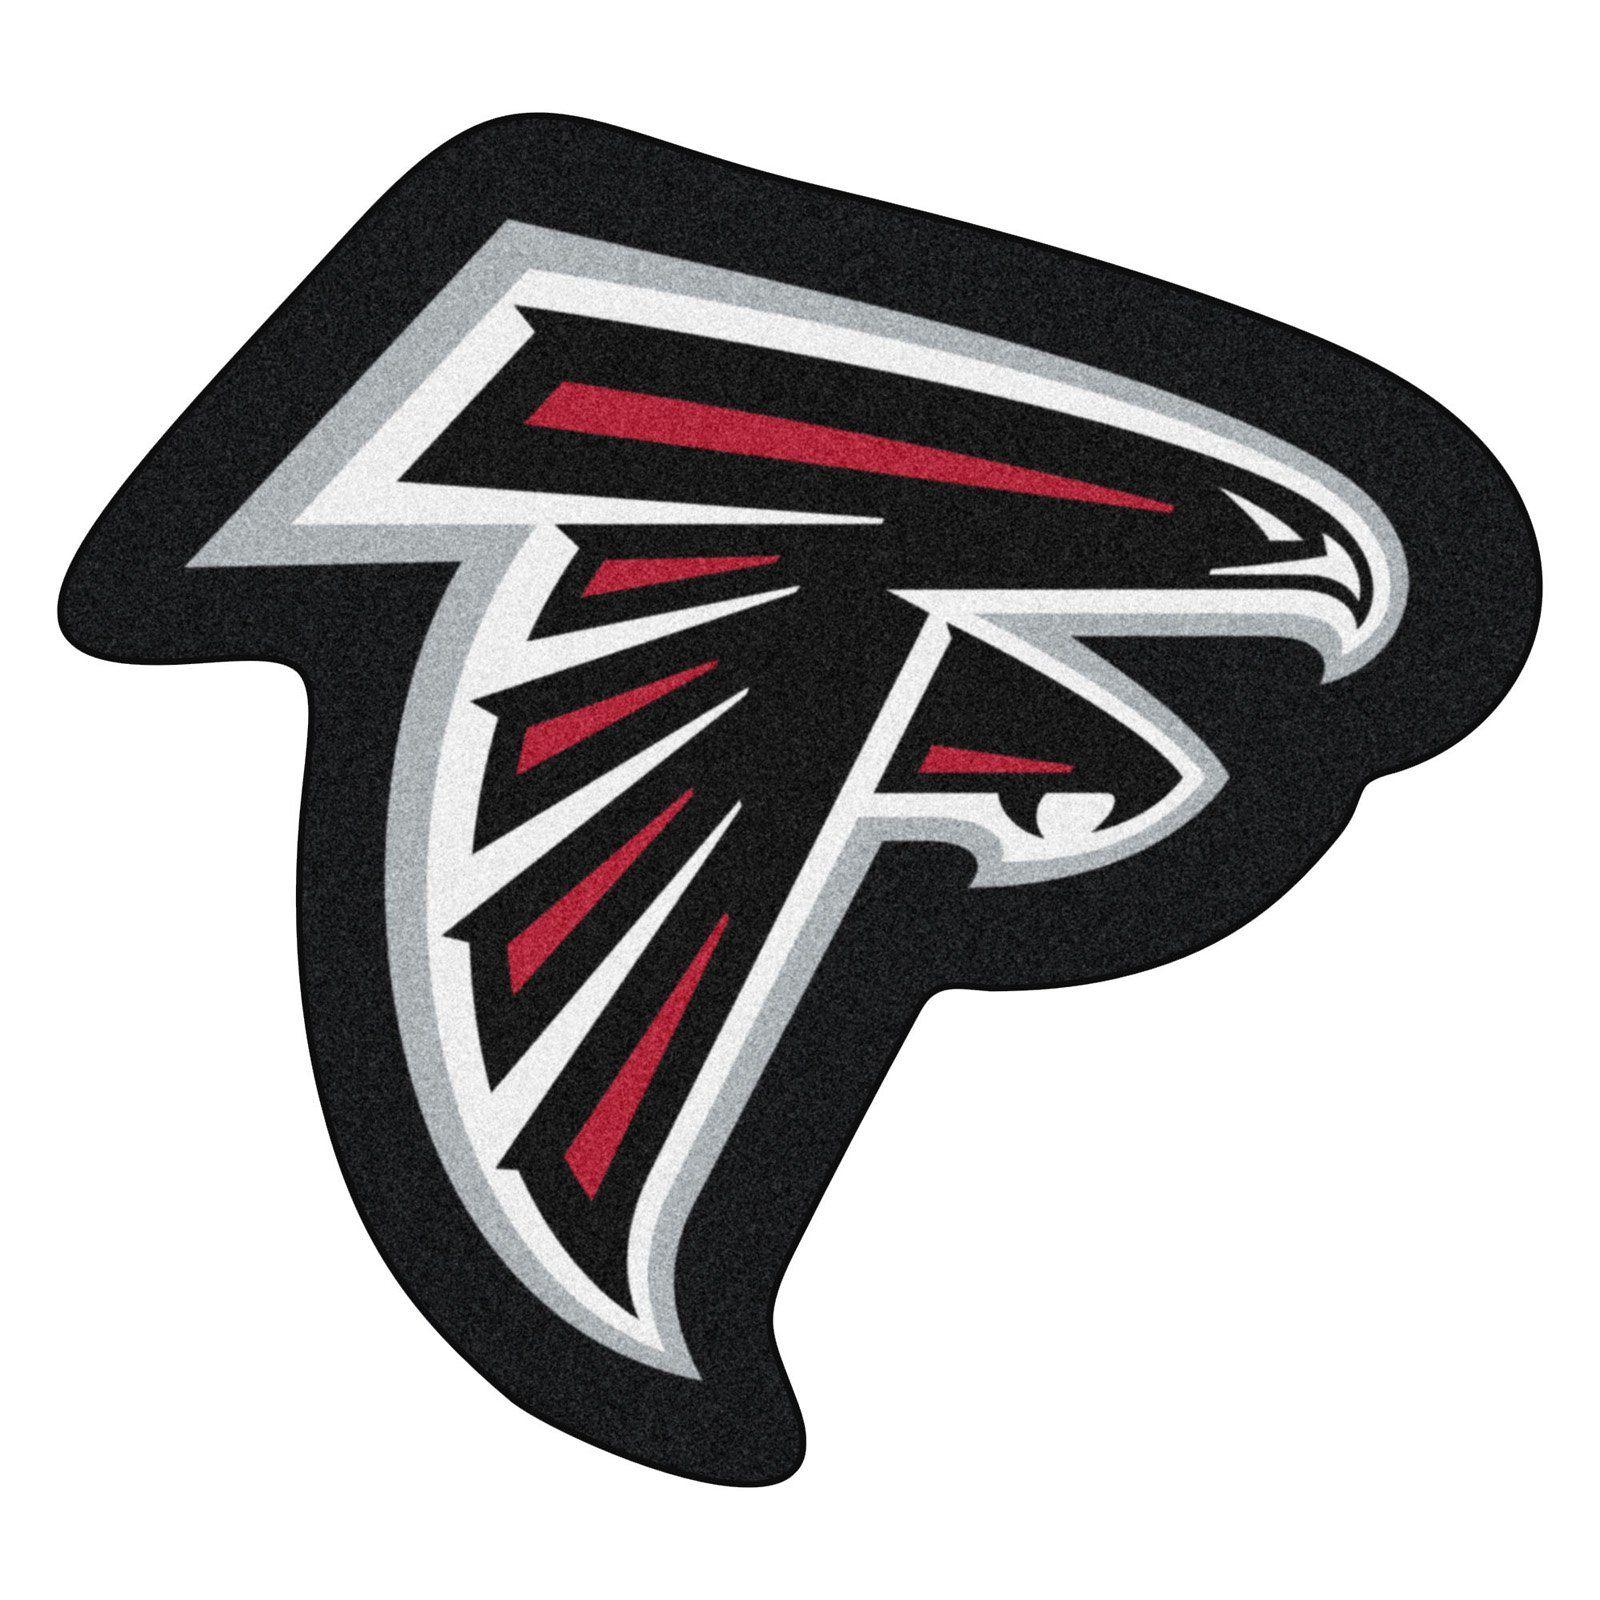 Fan Mats Nfl Football Mascot Indoor Rug Atlanta Falcons Logo Atlanta Falcons Signs Atlanta Falcons Vinyl